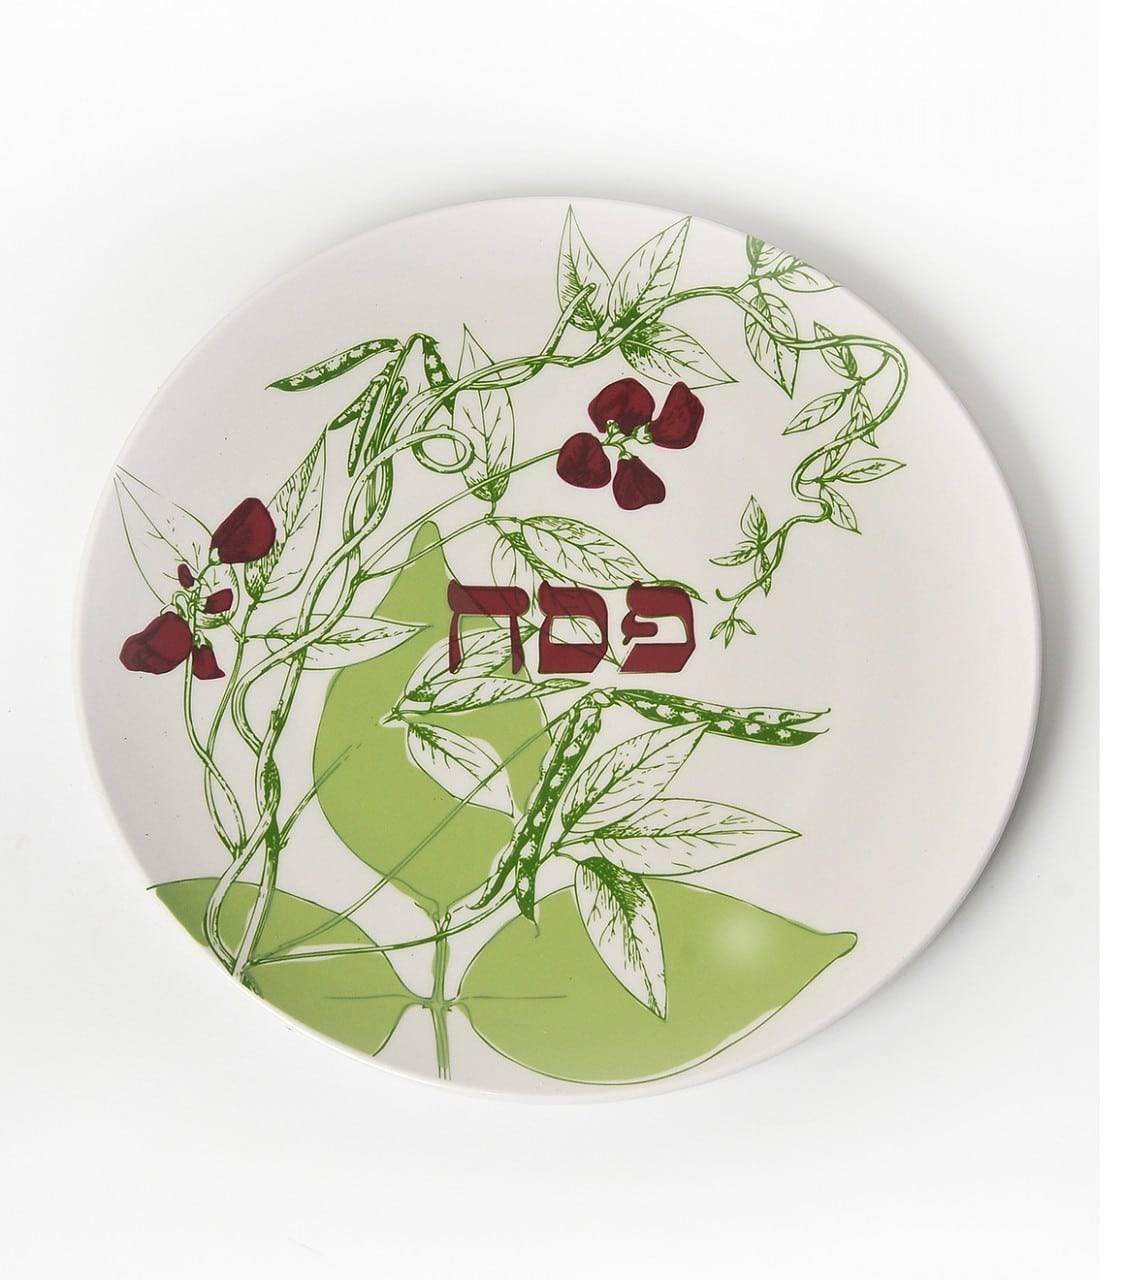 Plato de Seder - Botánico